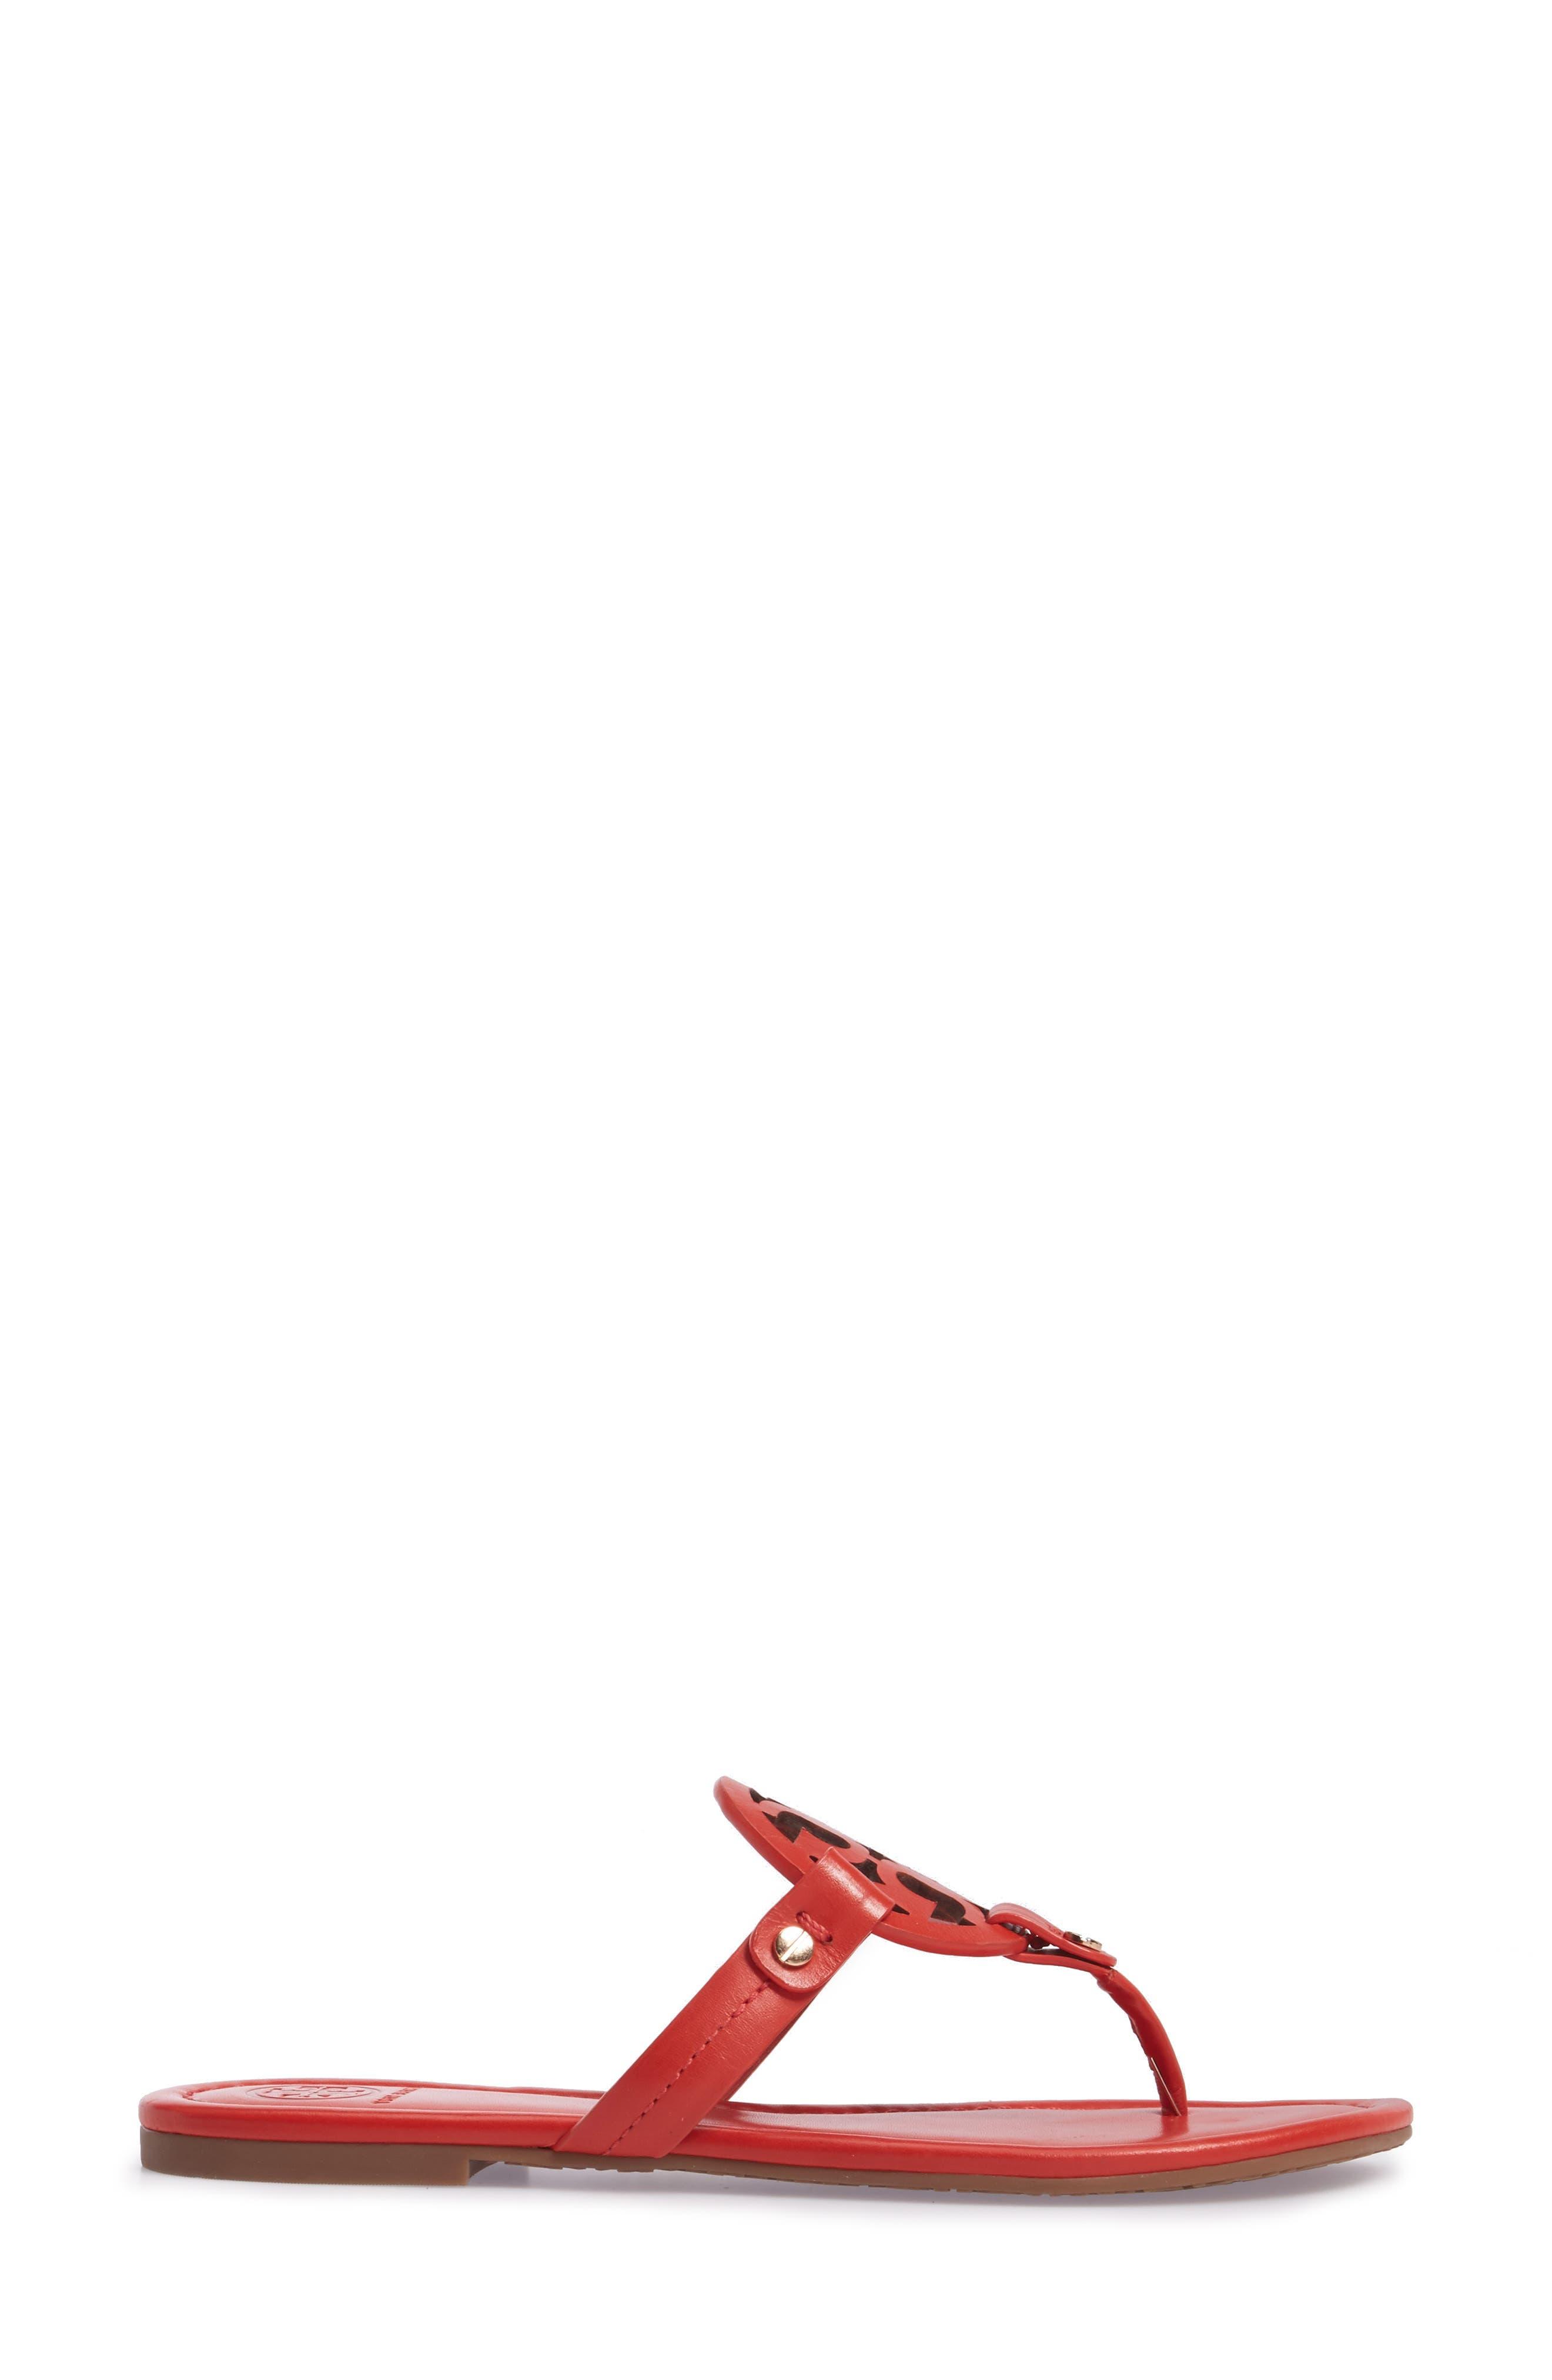 Alternate Image 3  - Tory Burch 'Miller' Flip Flop (Women)